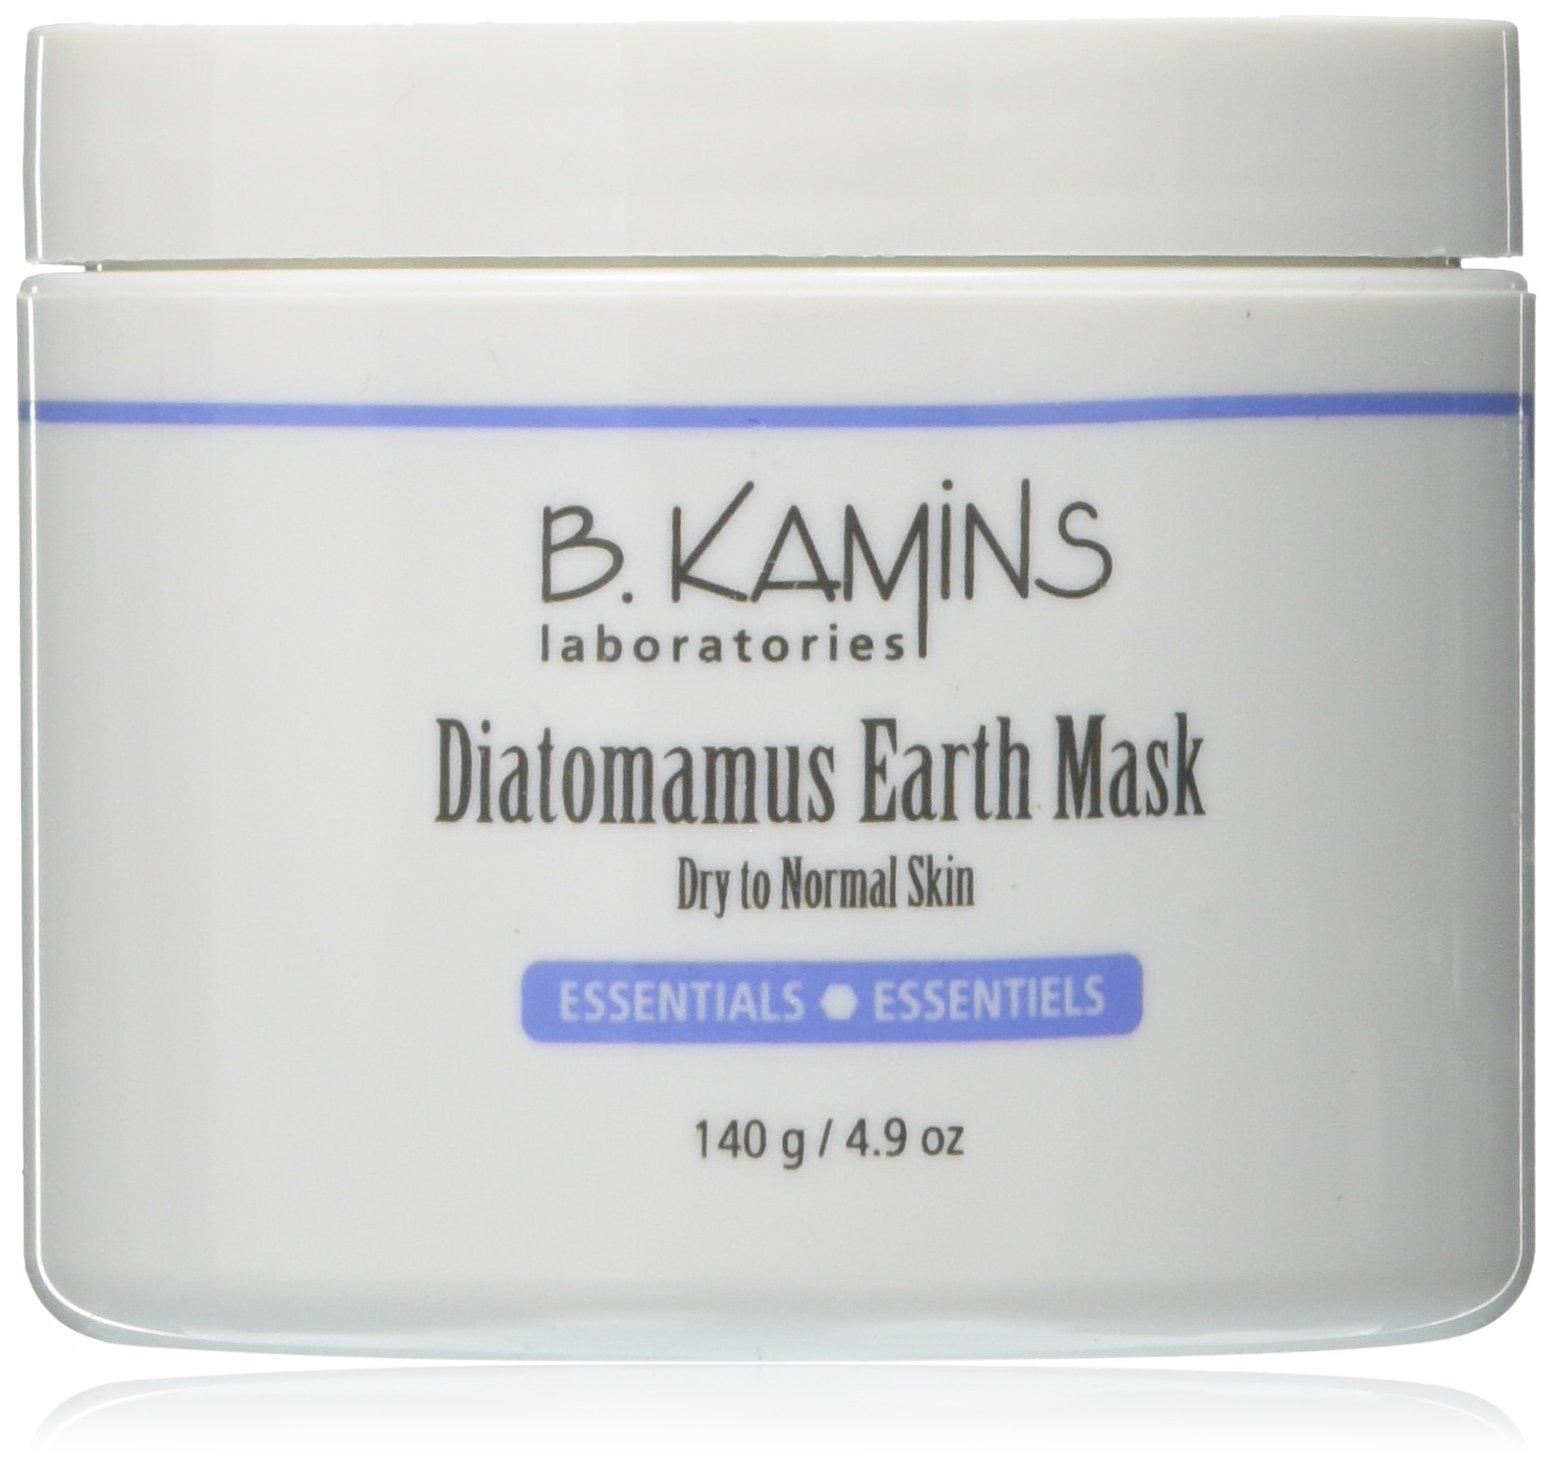 B. Kamins Diatomamus Earth Mask, 4.9 Ounce